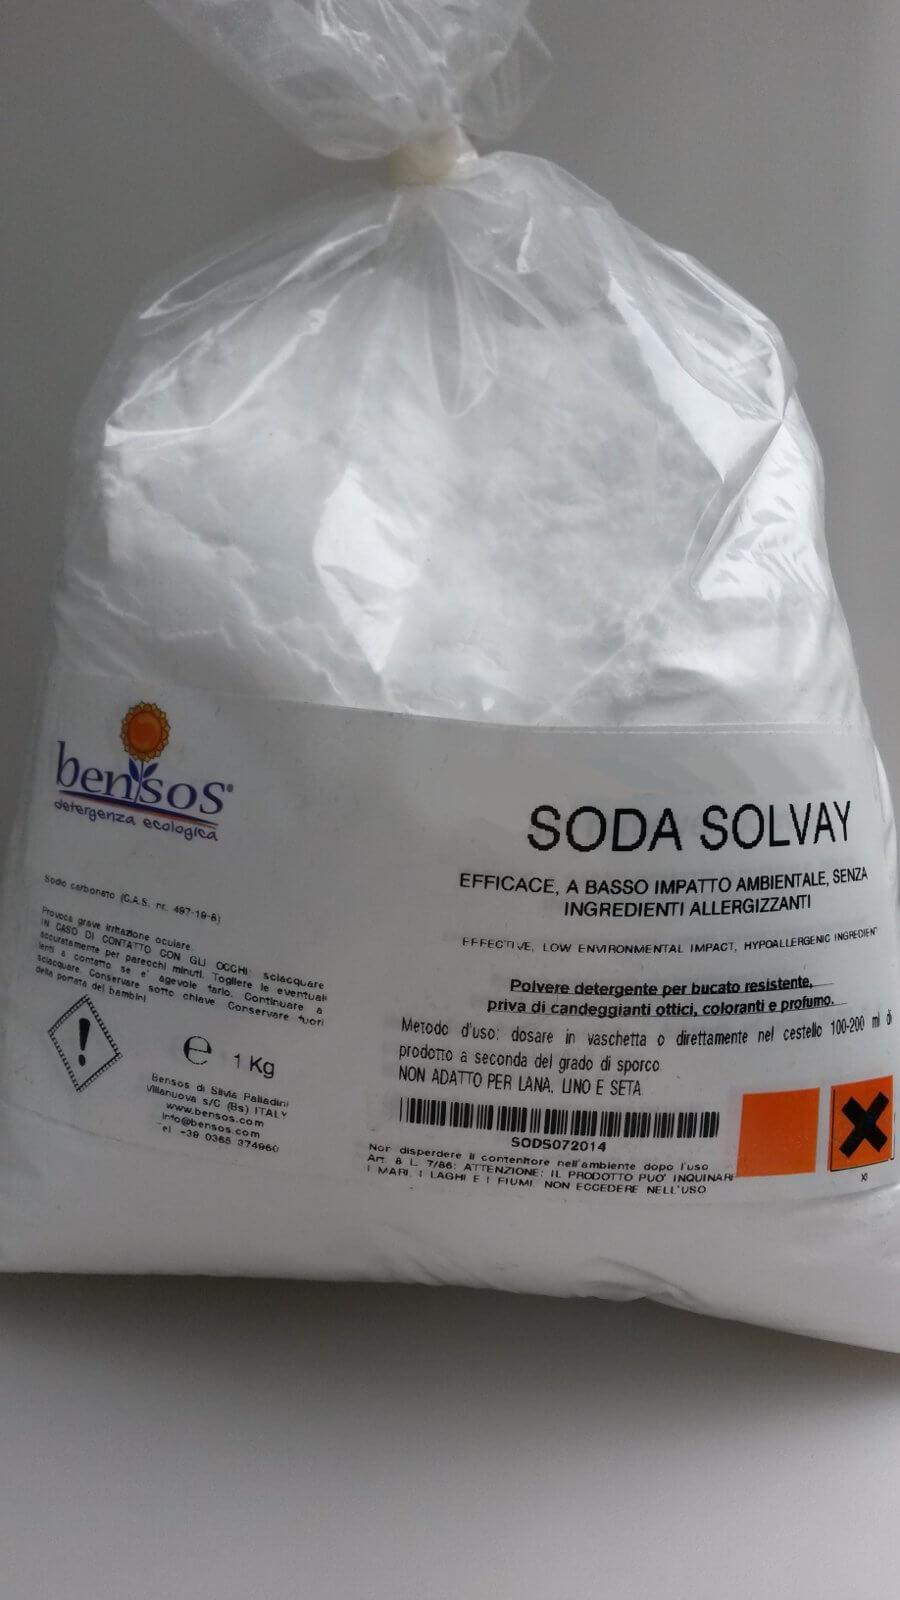 Soda Solvay polvere detergente alcalina